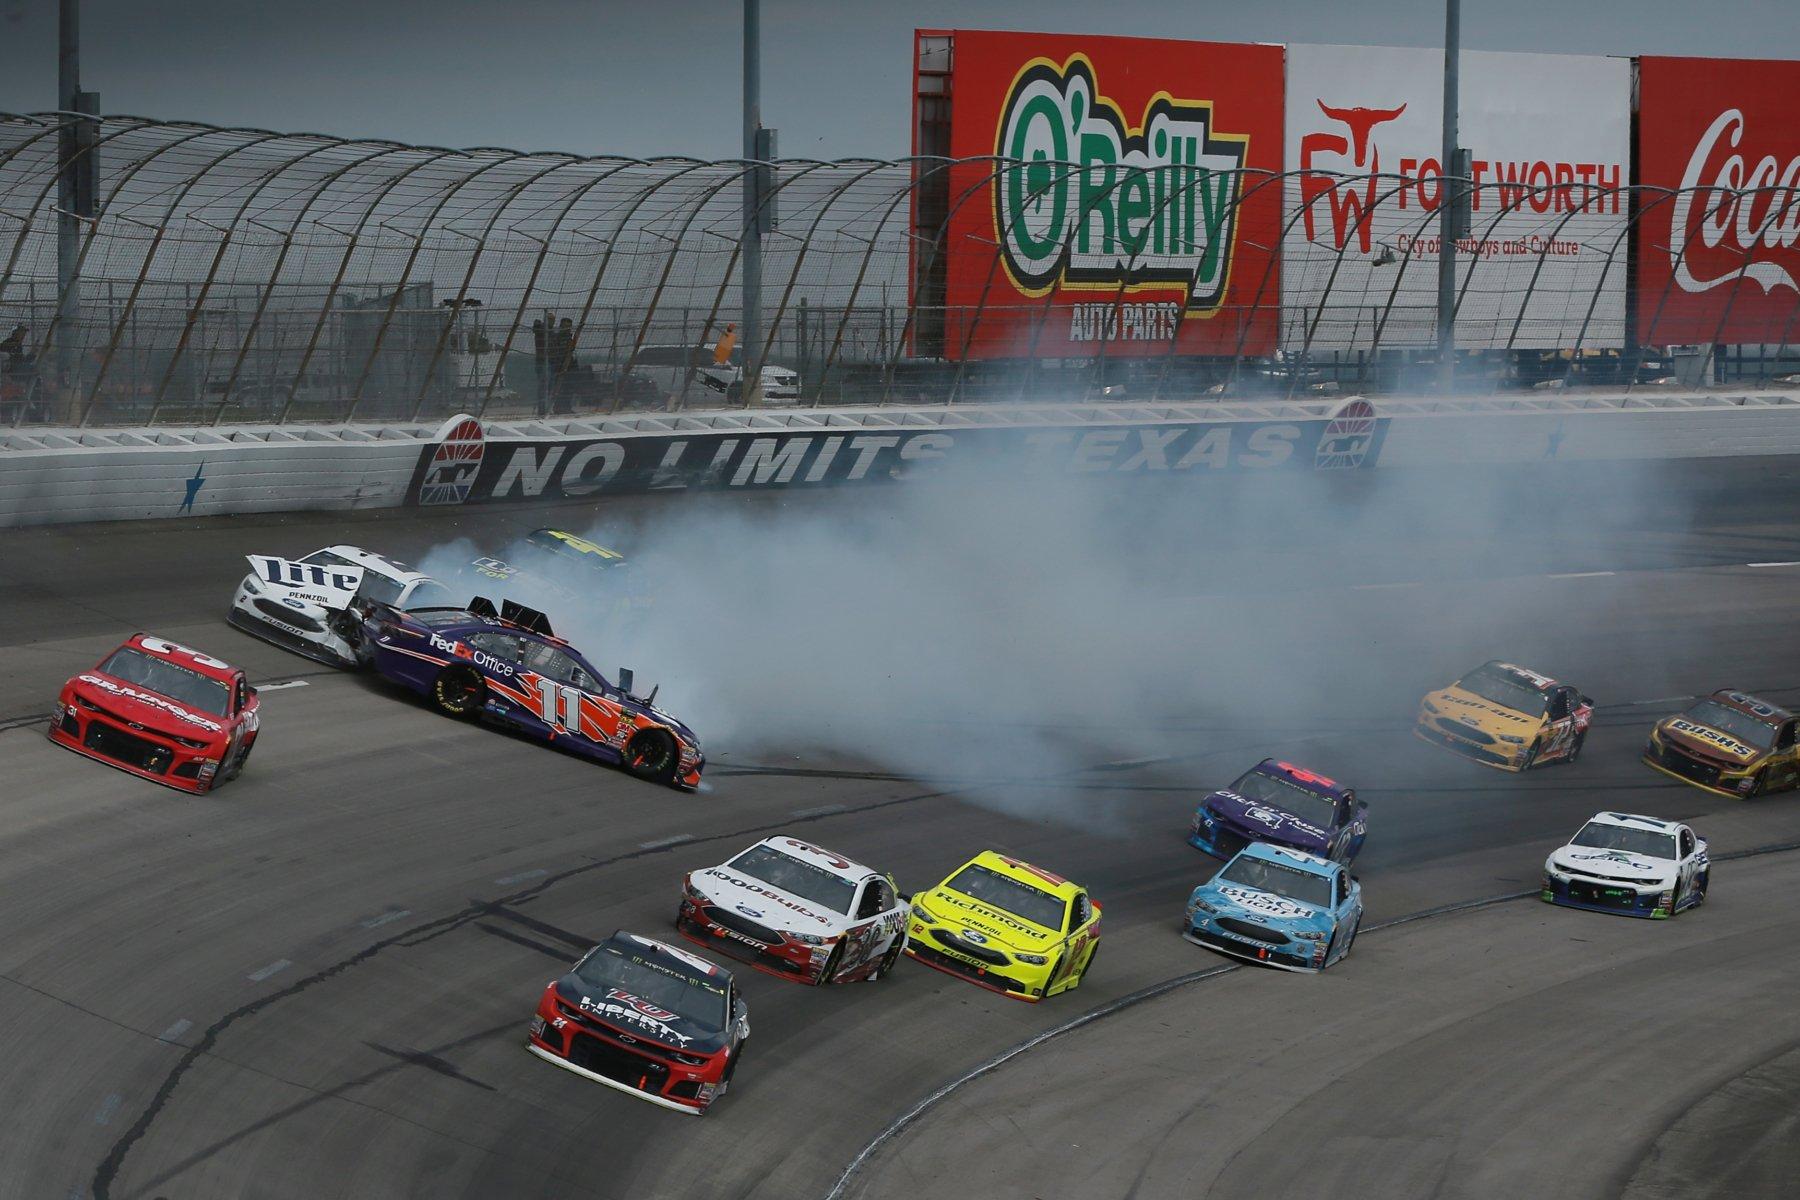 Hamlin and Keselowski crash at Texas Motor Speedway